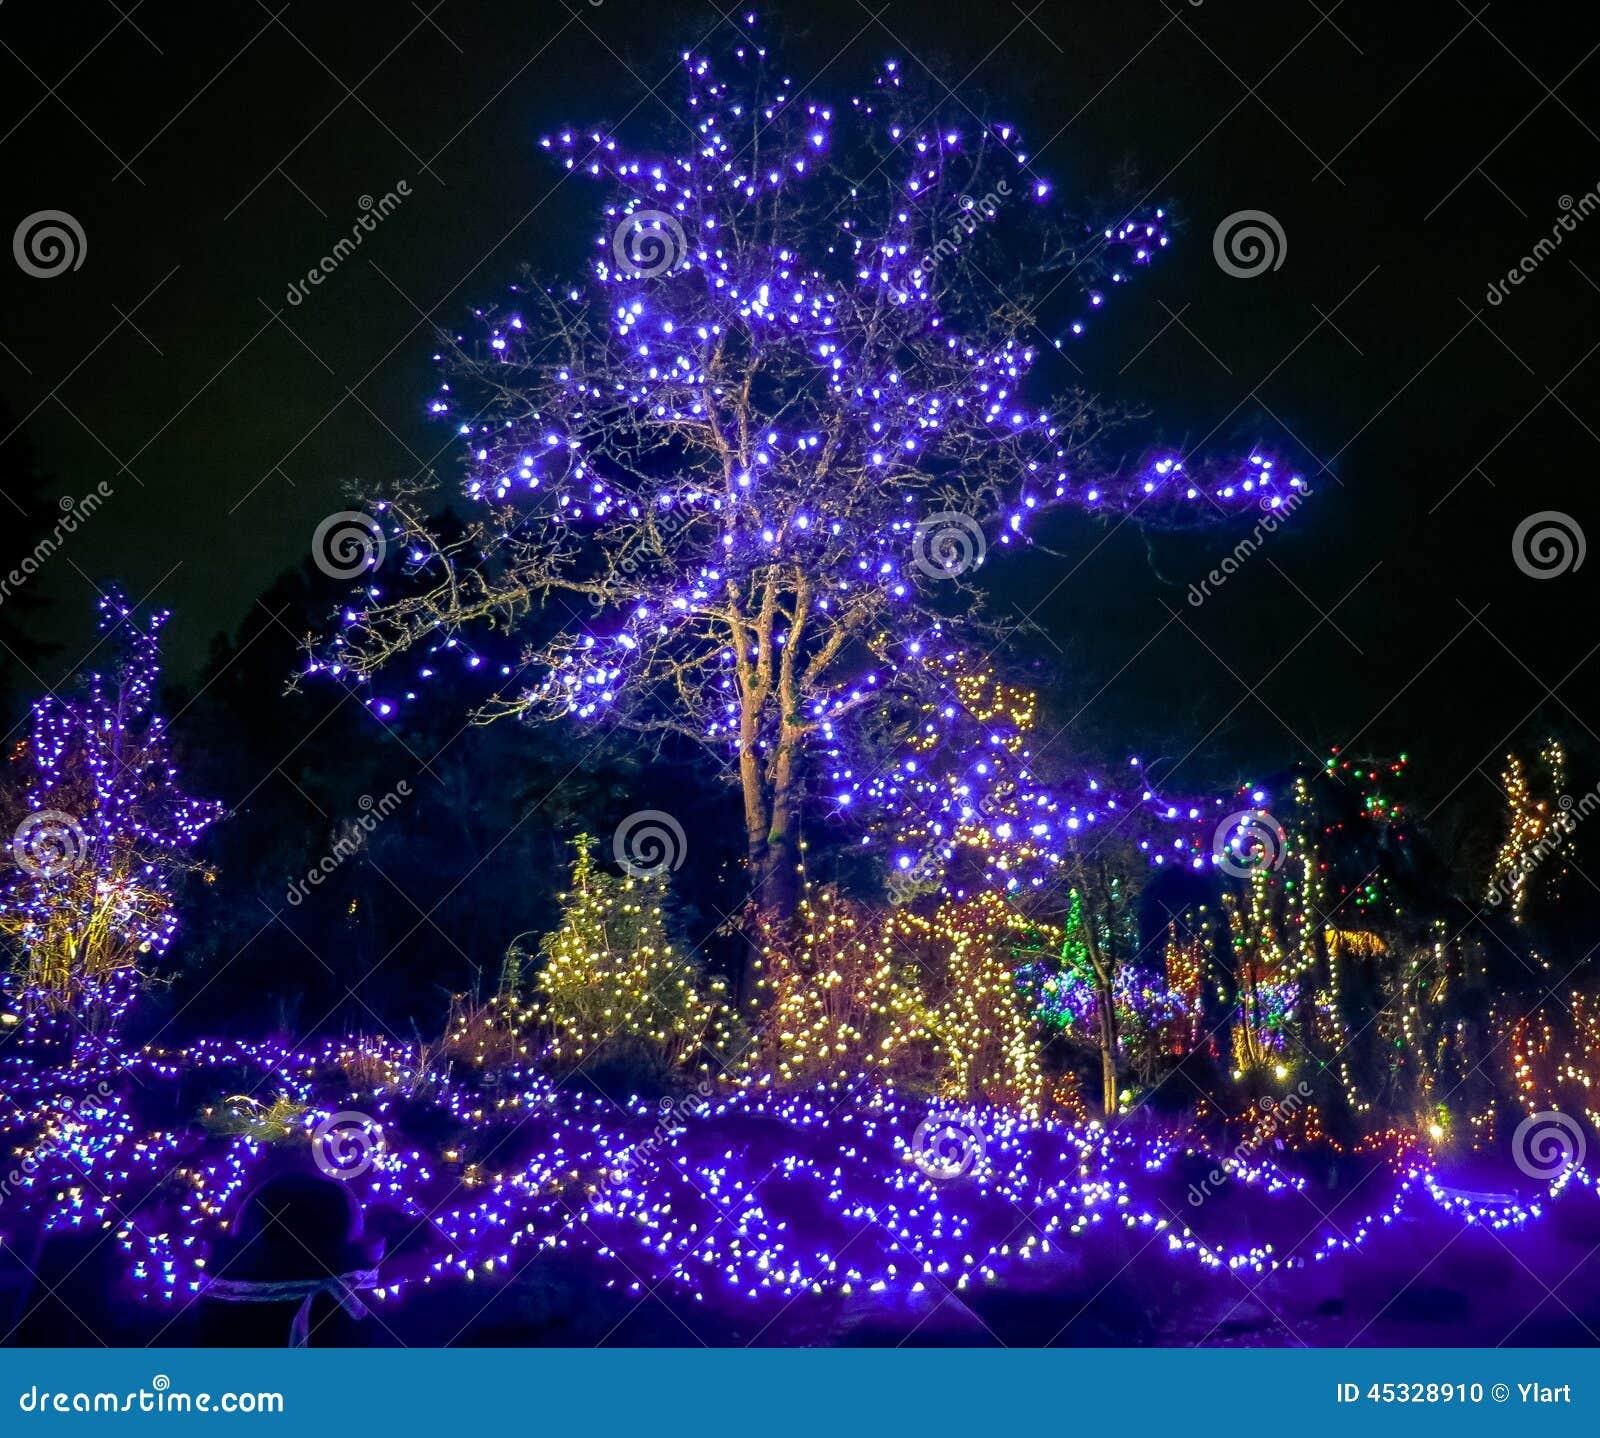 Outdoor Christmas Lights Stock Photo Image 45328910